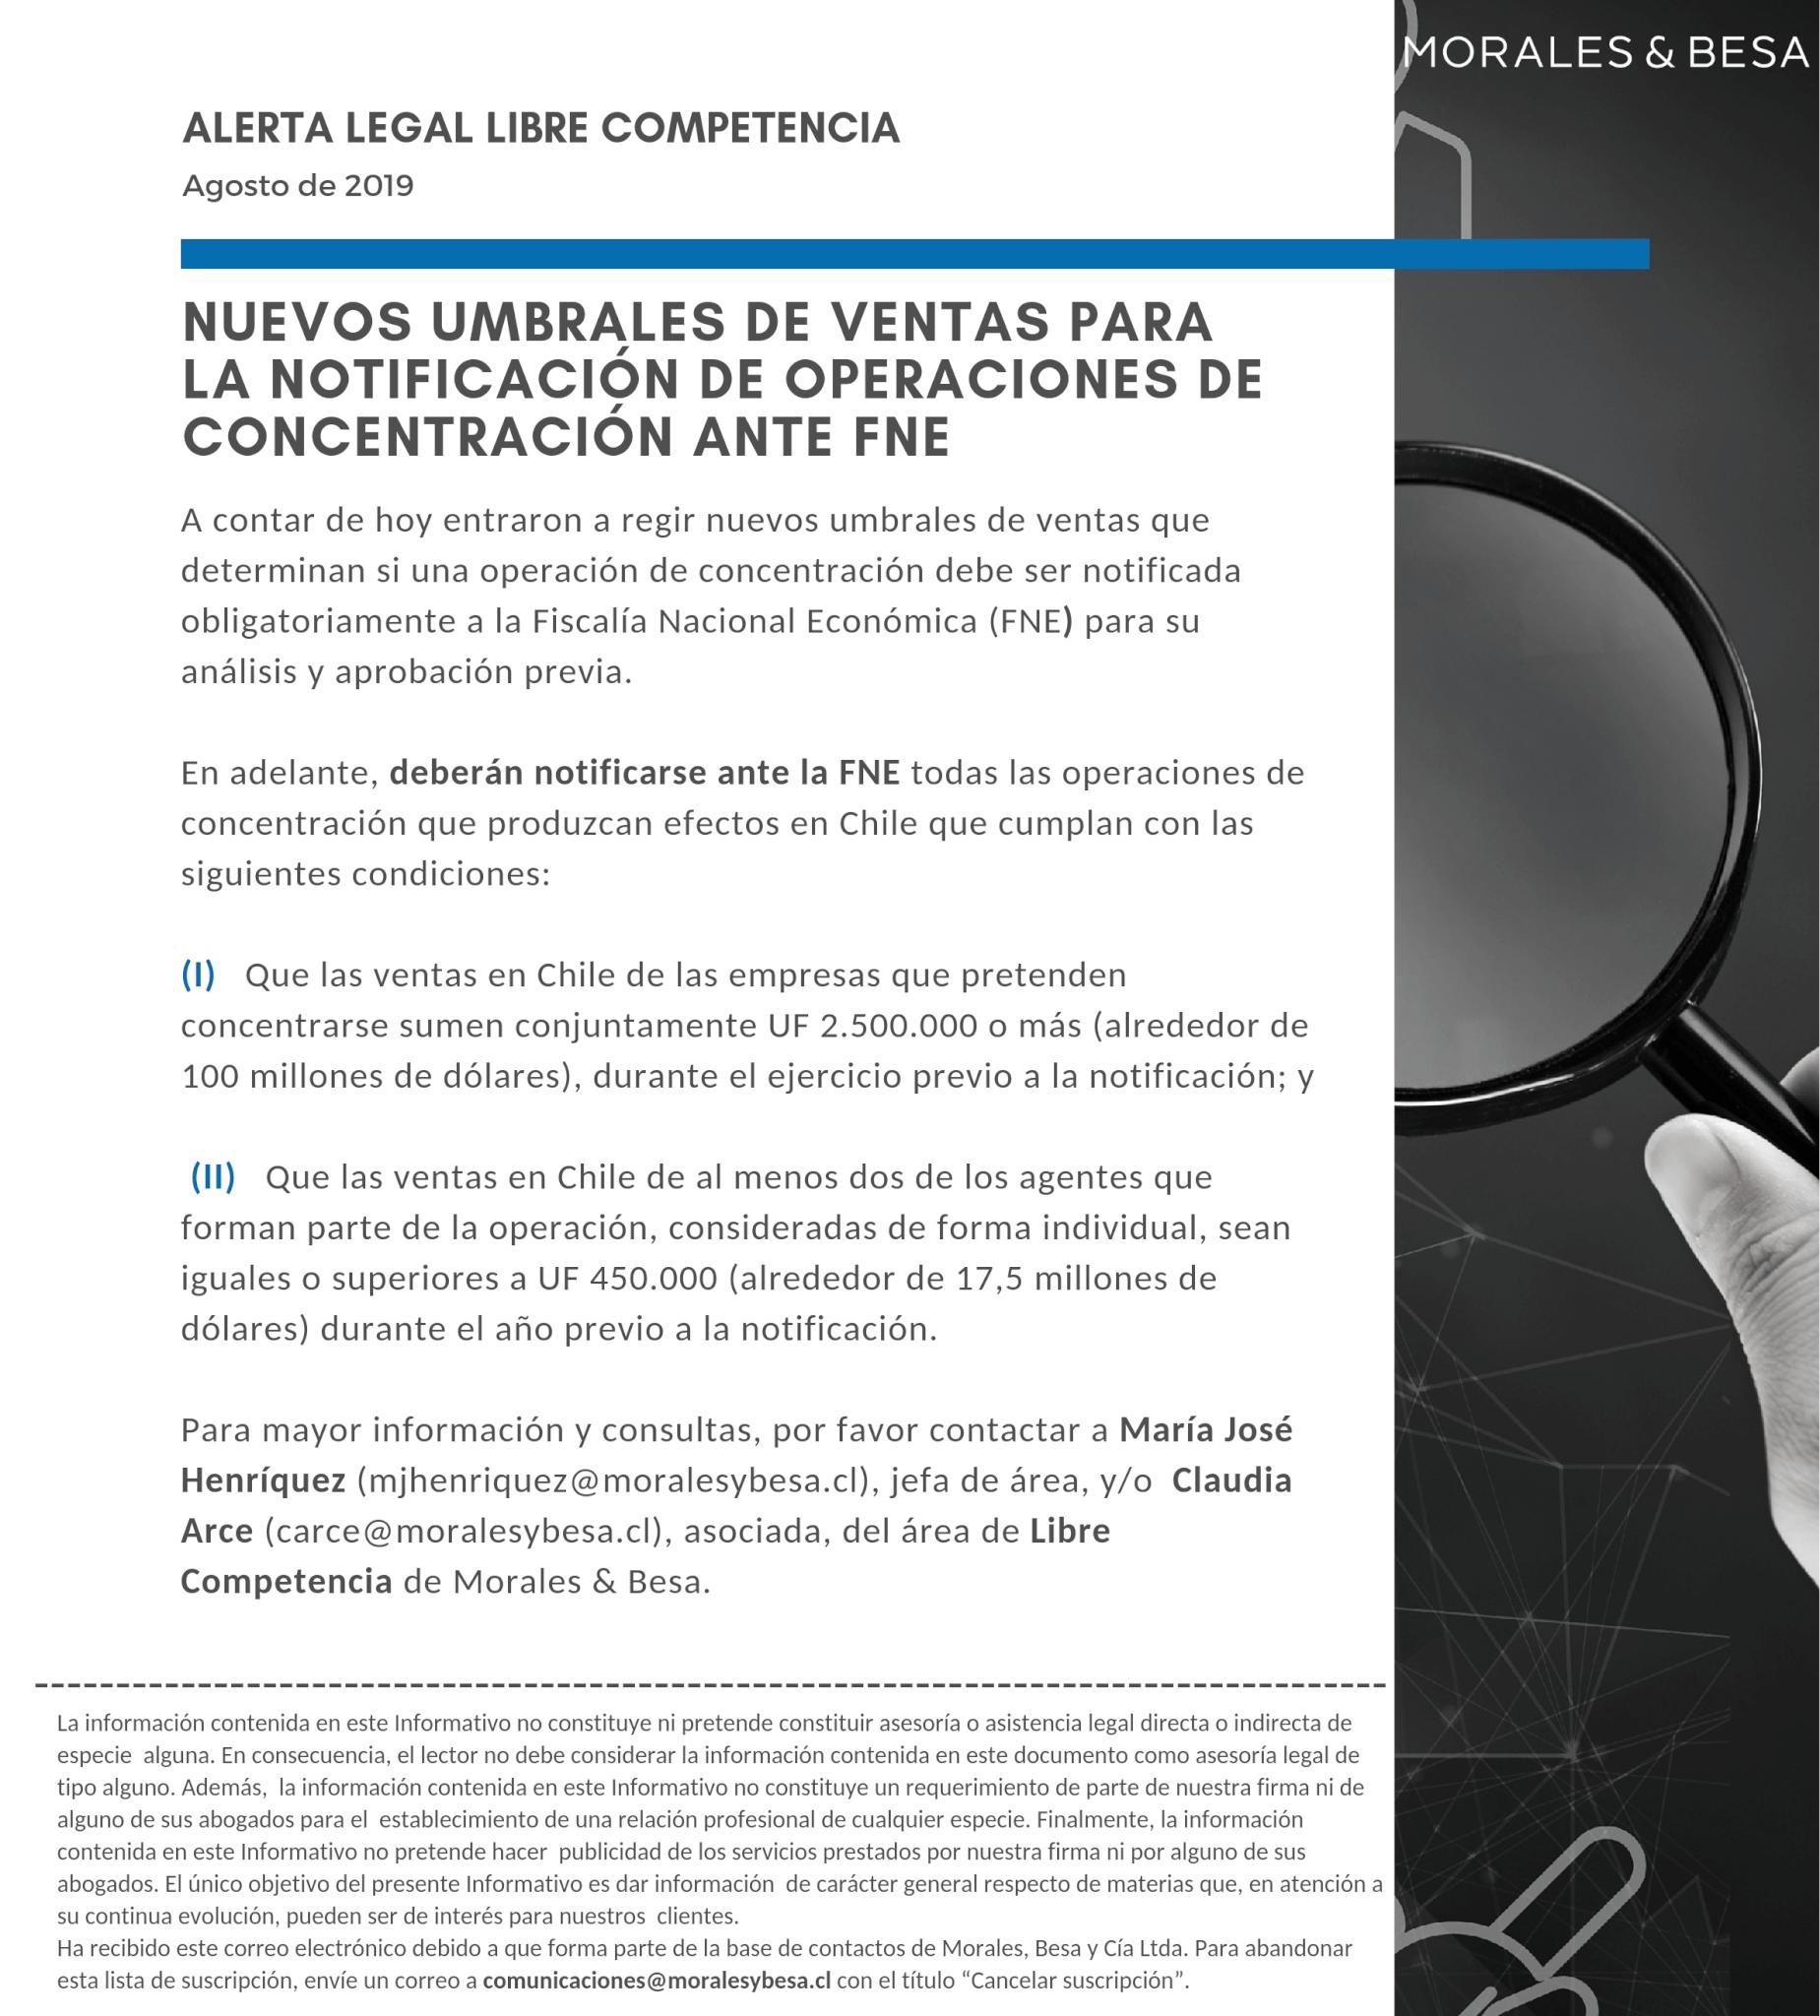 Alerta Legal Libre Competencia - Agosto de 2019